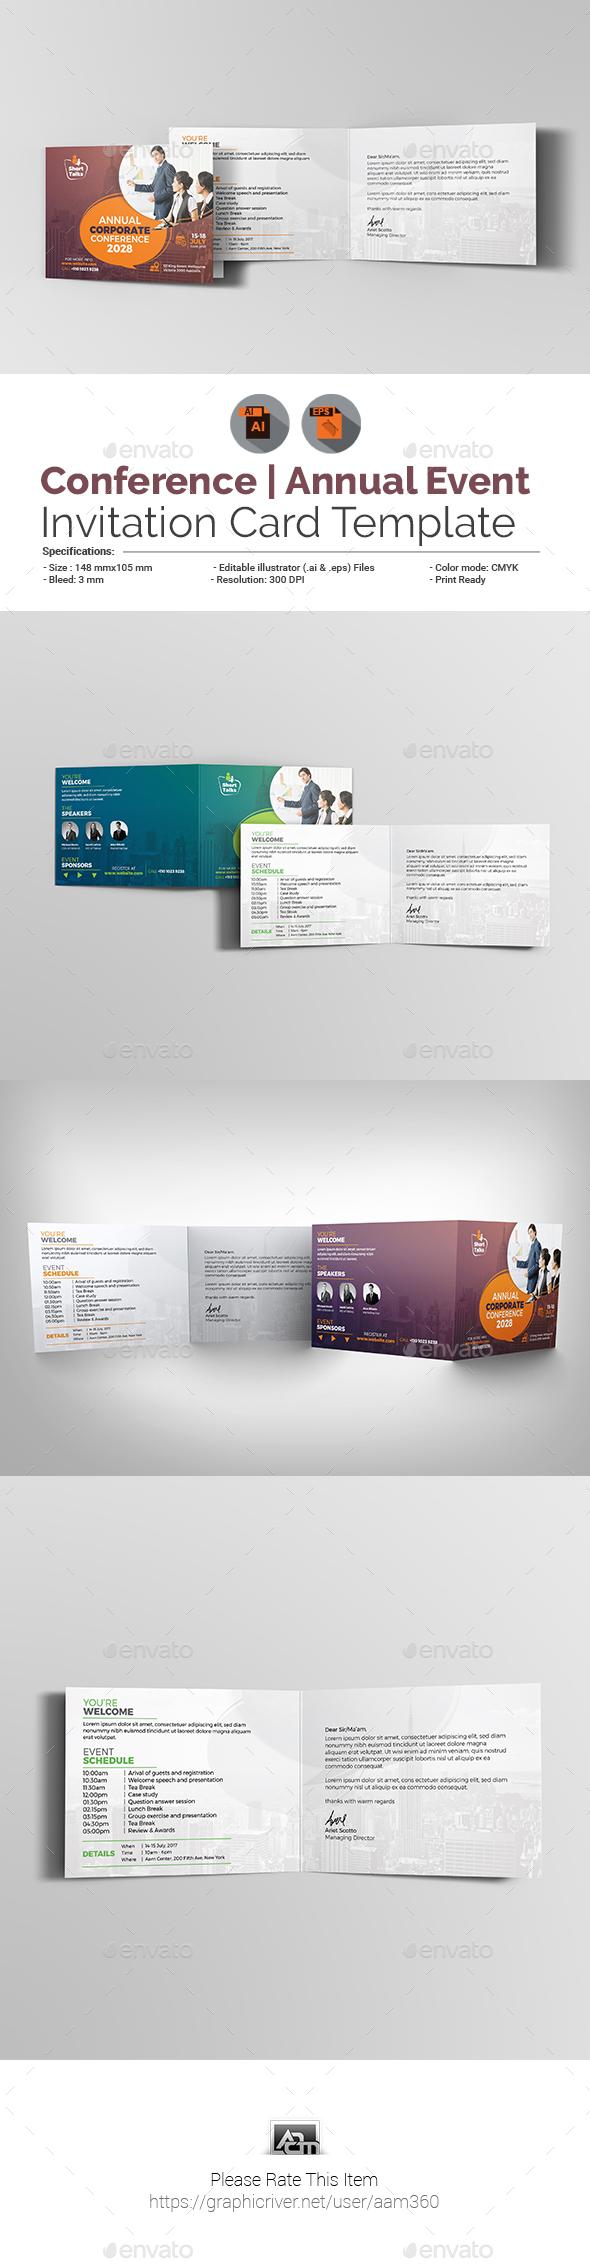 Summit Card Designs Invite Templates From Graphicriver